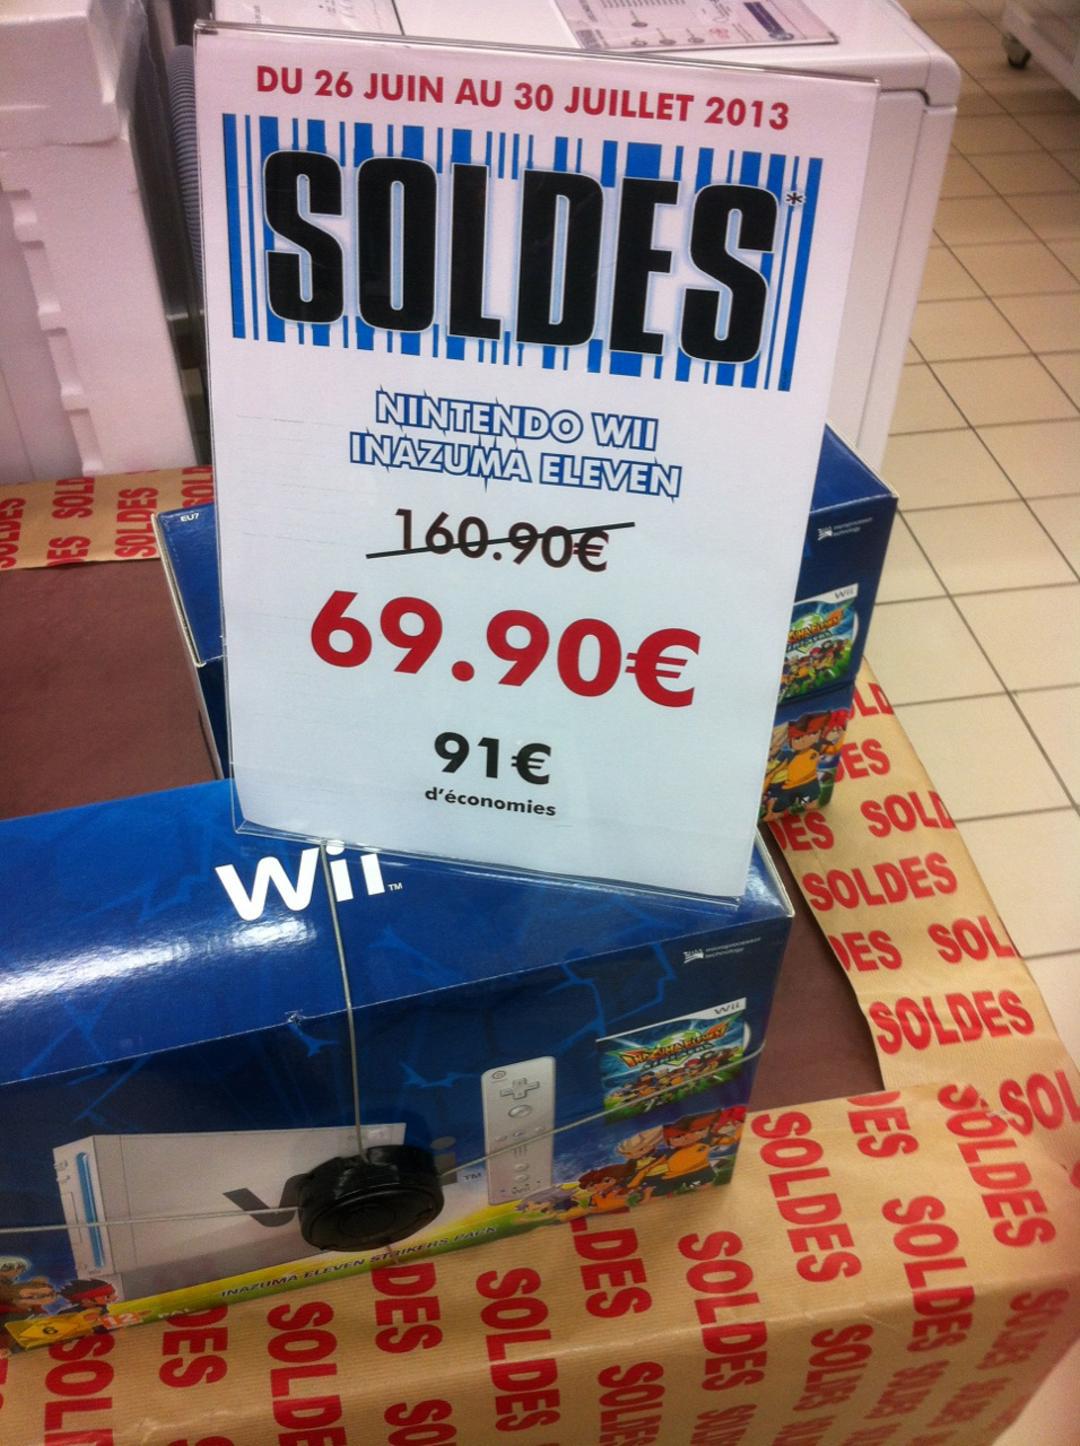 Console Nintendo WII Pack Inazuma Eleven Strikers